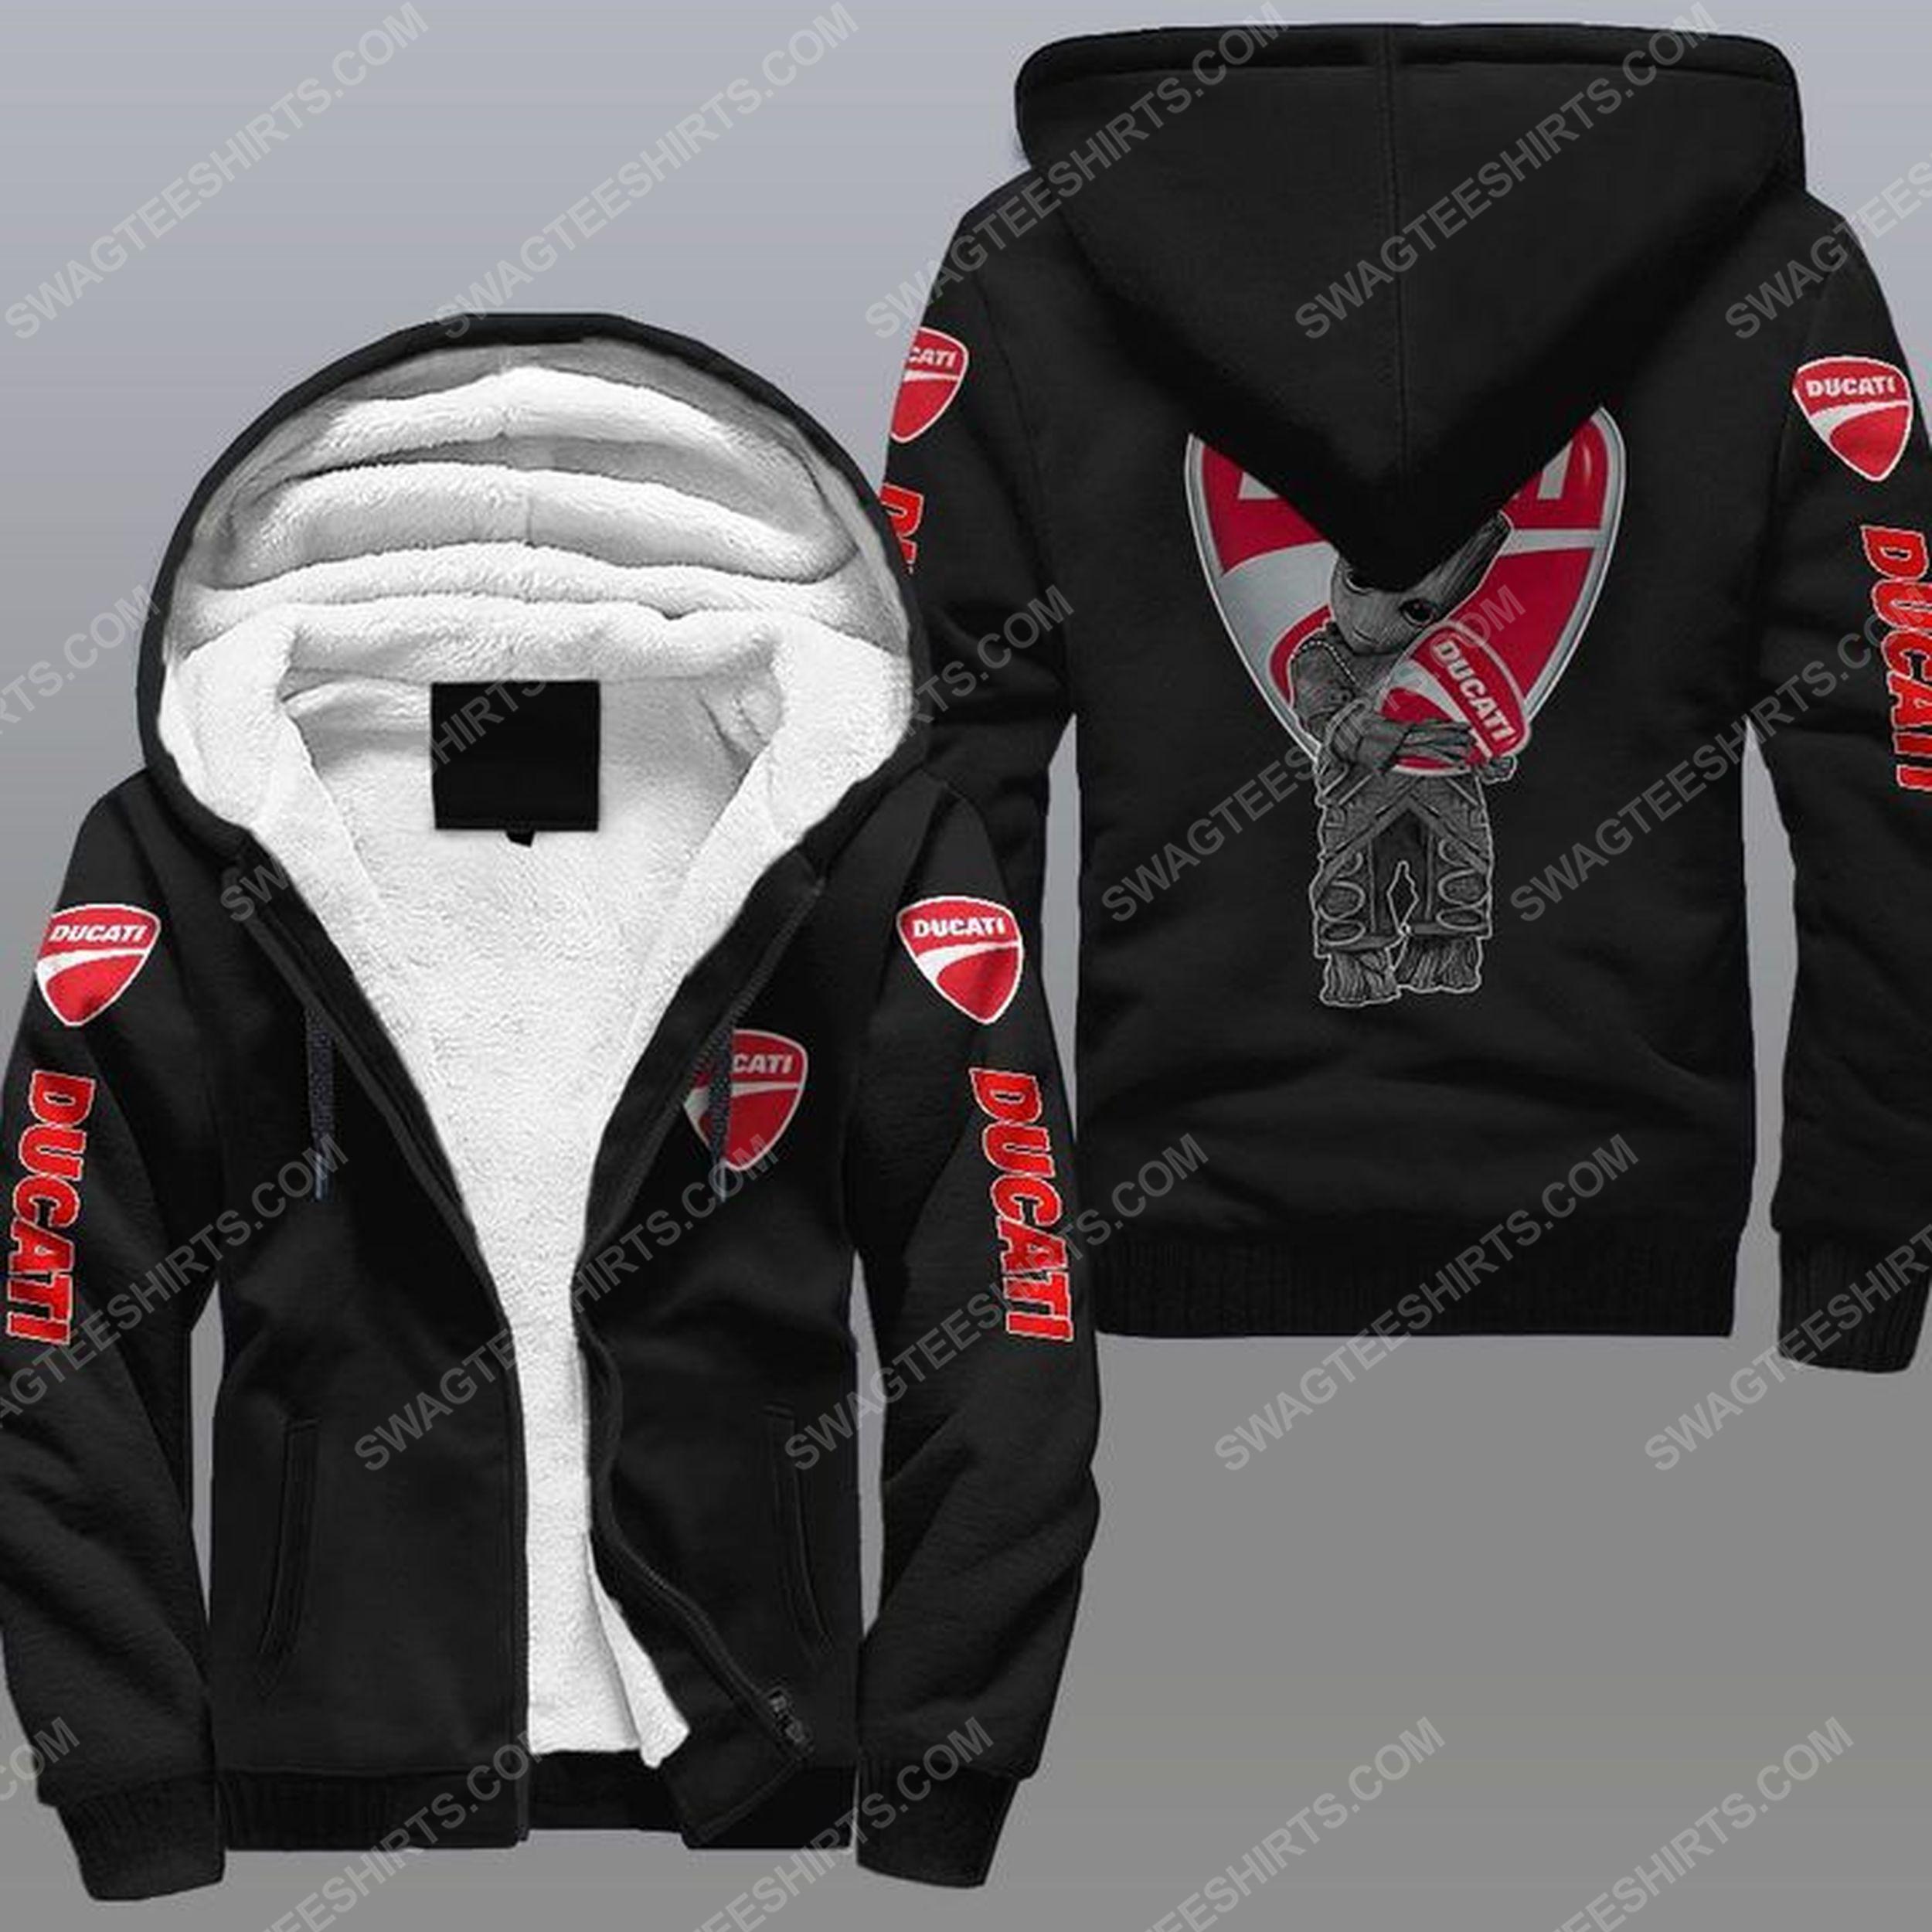 Baby groot and ducati all over print fleece hoodie - black 1